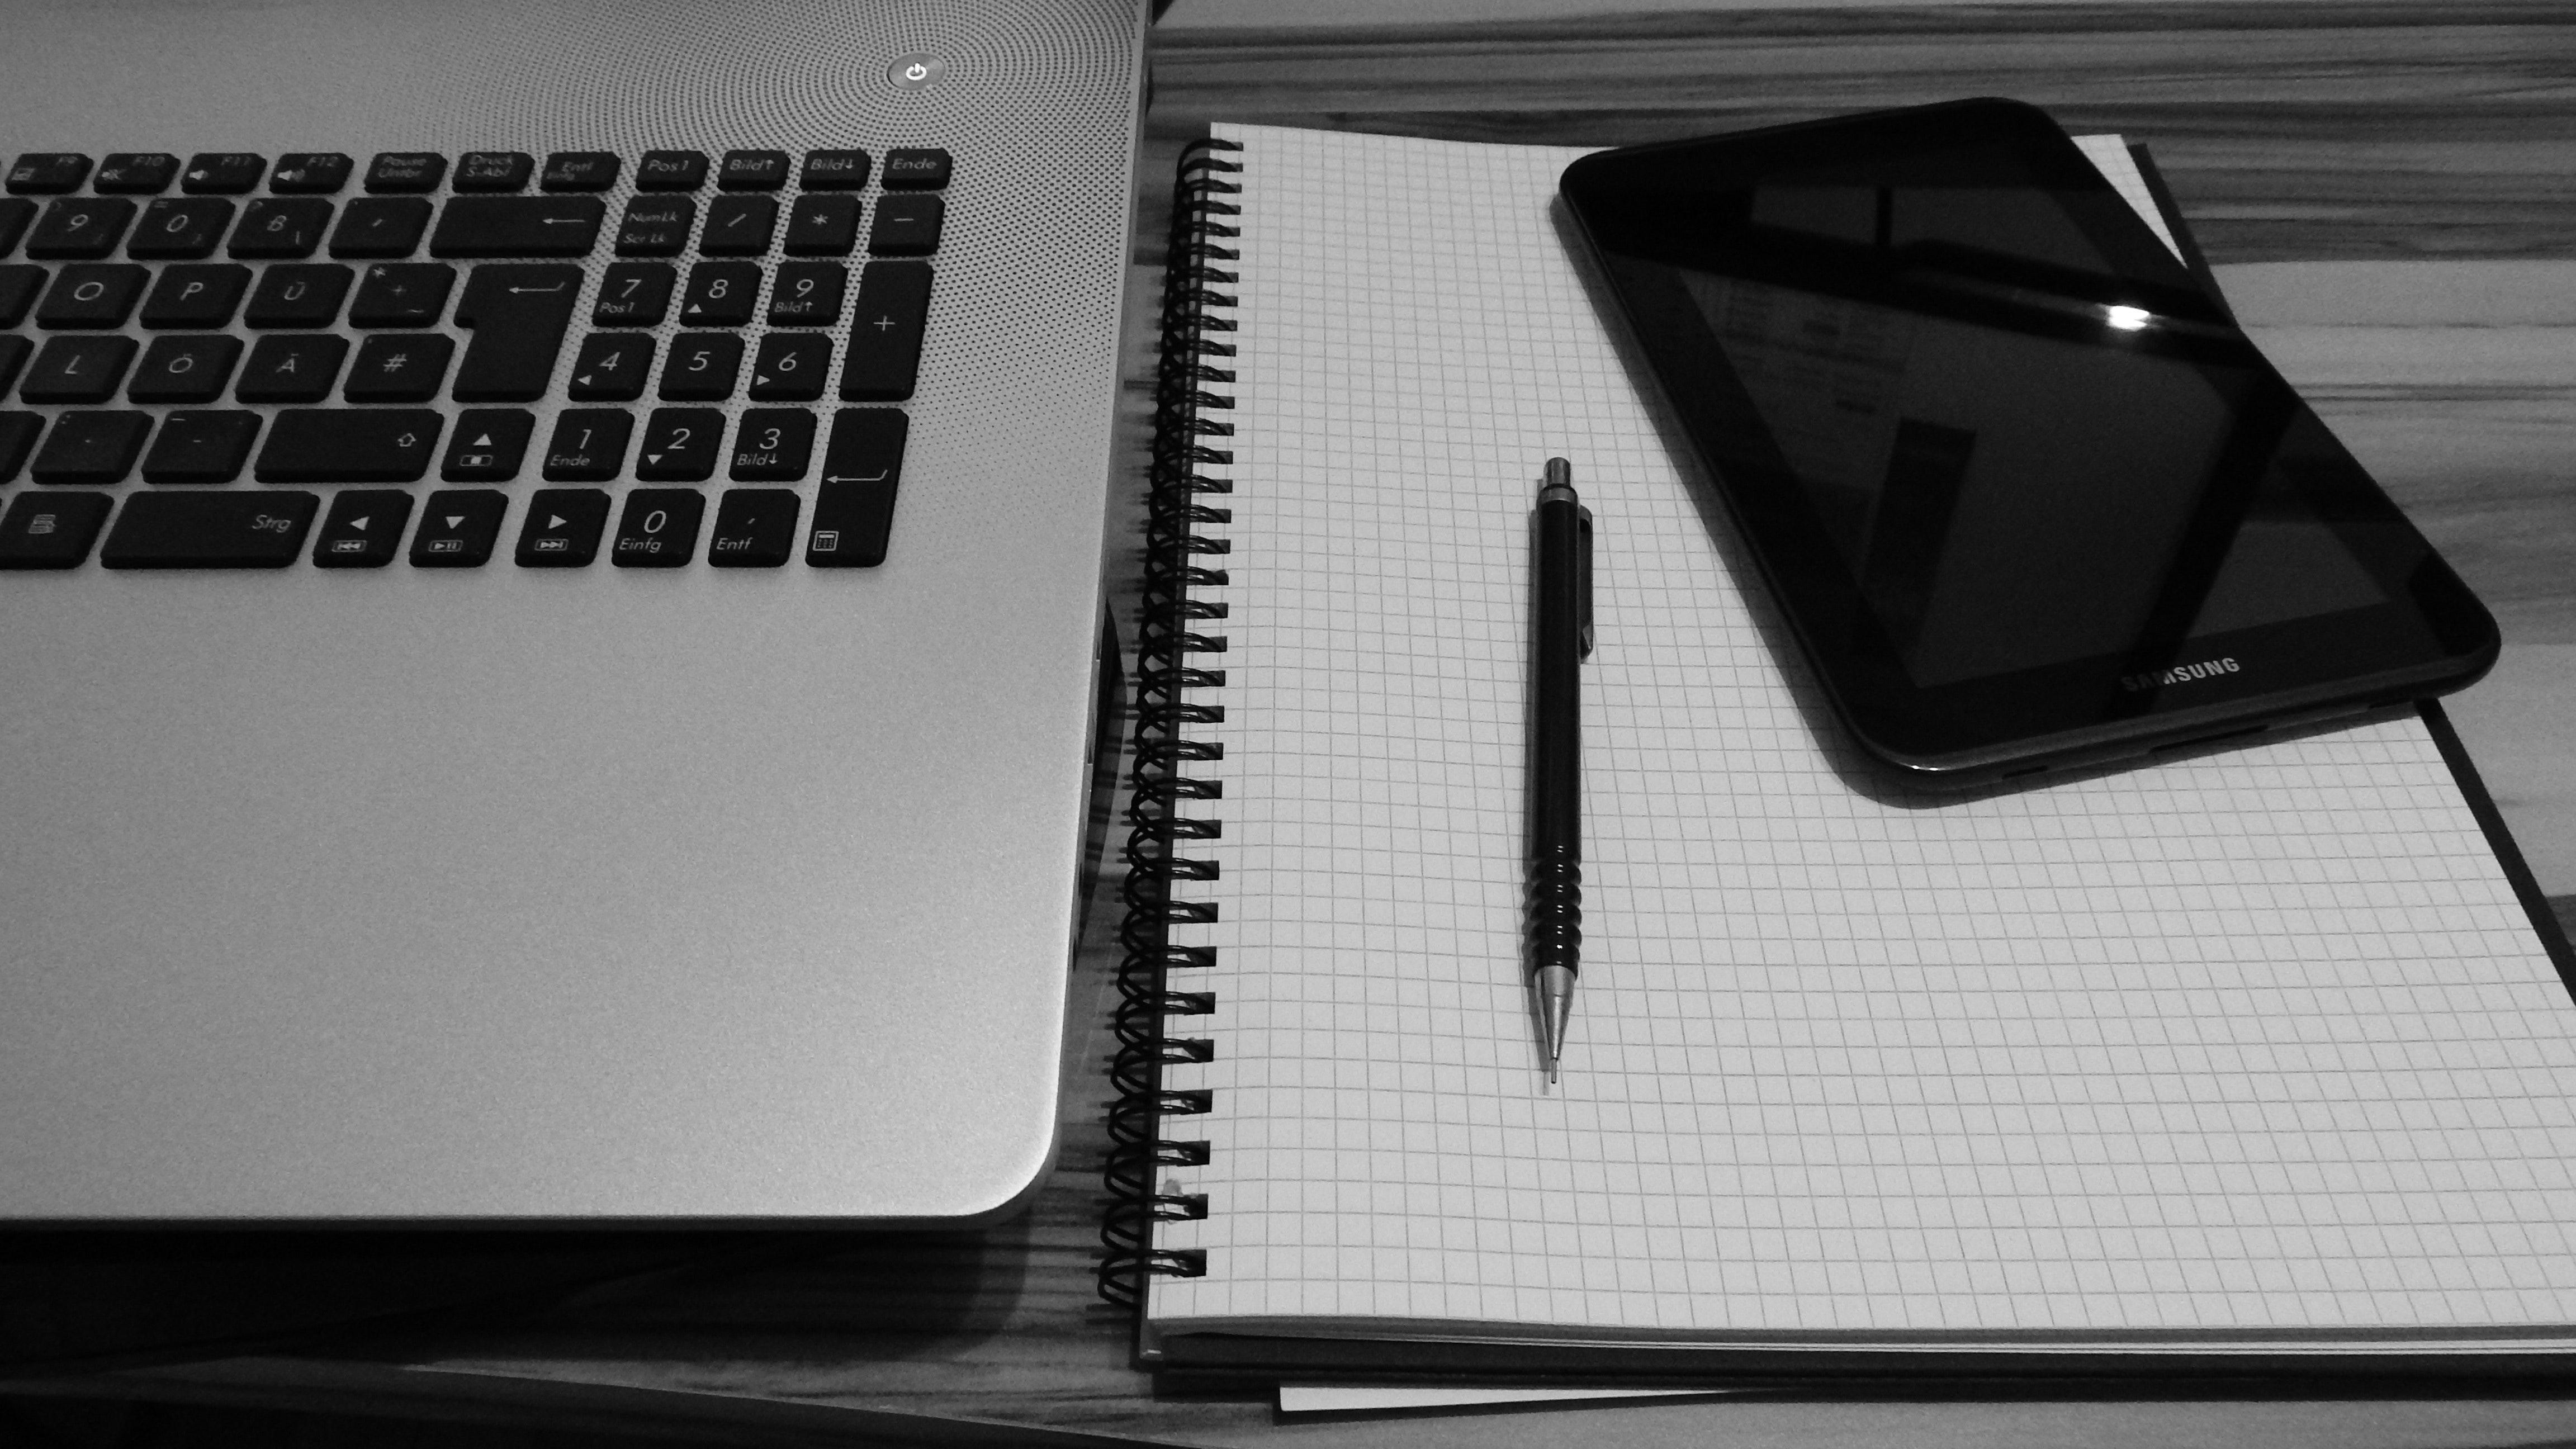 Smartphone Displaying Black Screen Beside Retractable Pen On Grid